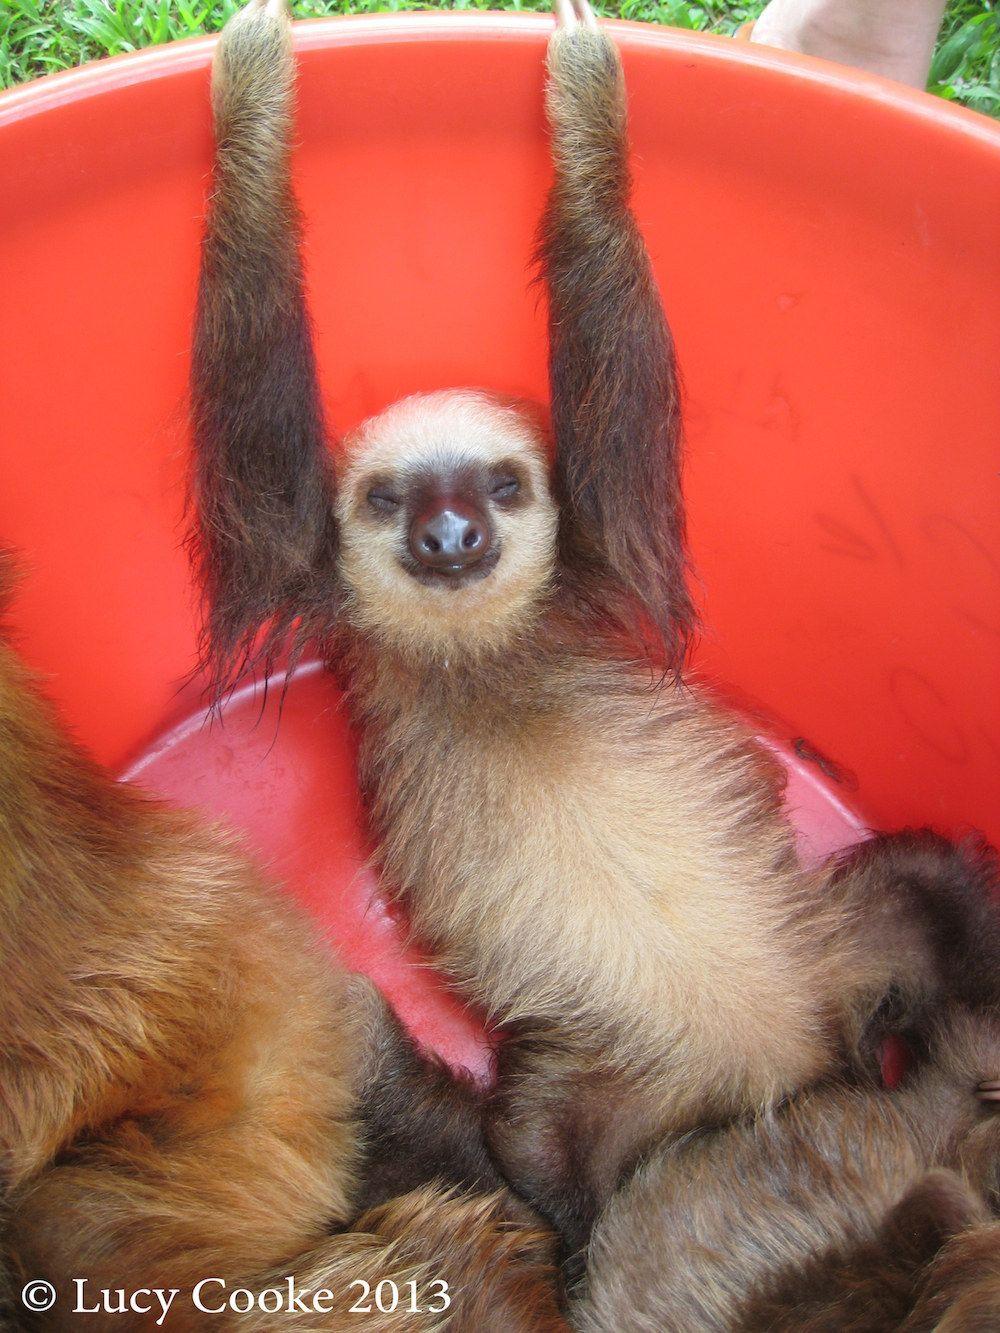 Dozy sloths. Cute sloth, Sloth, Baby sloth